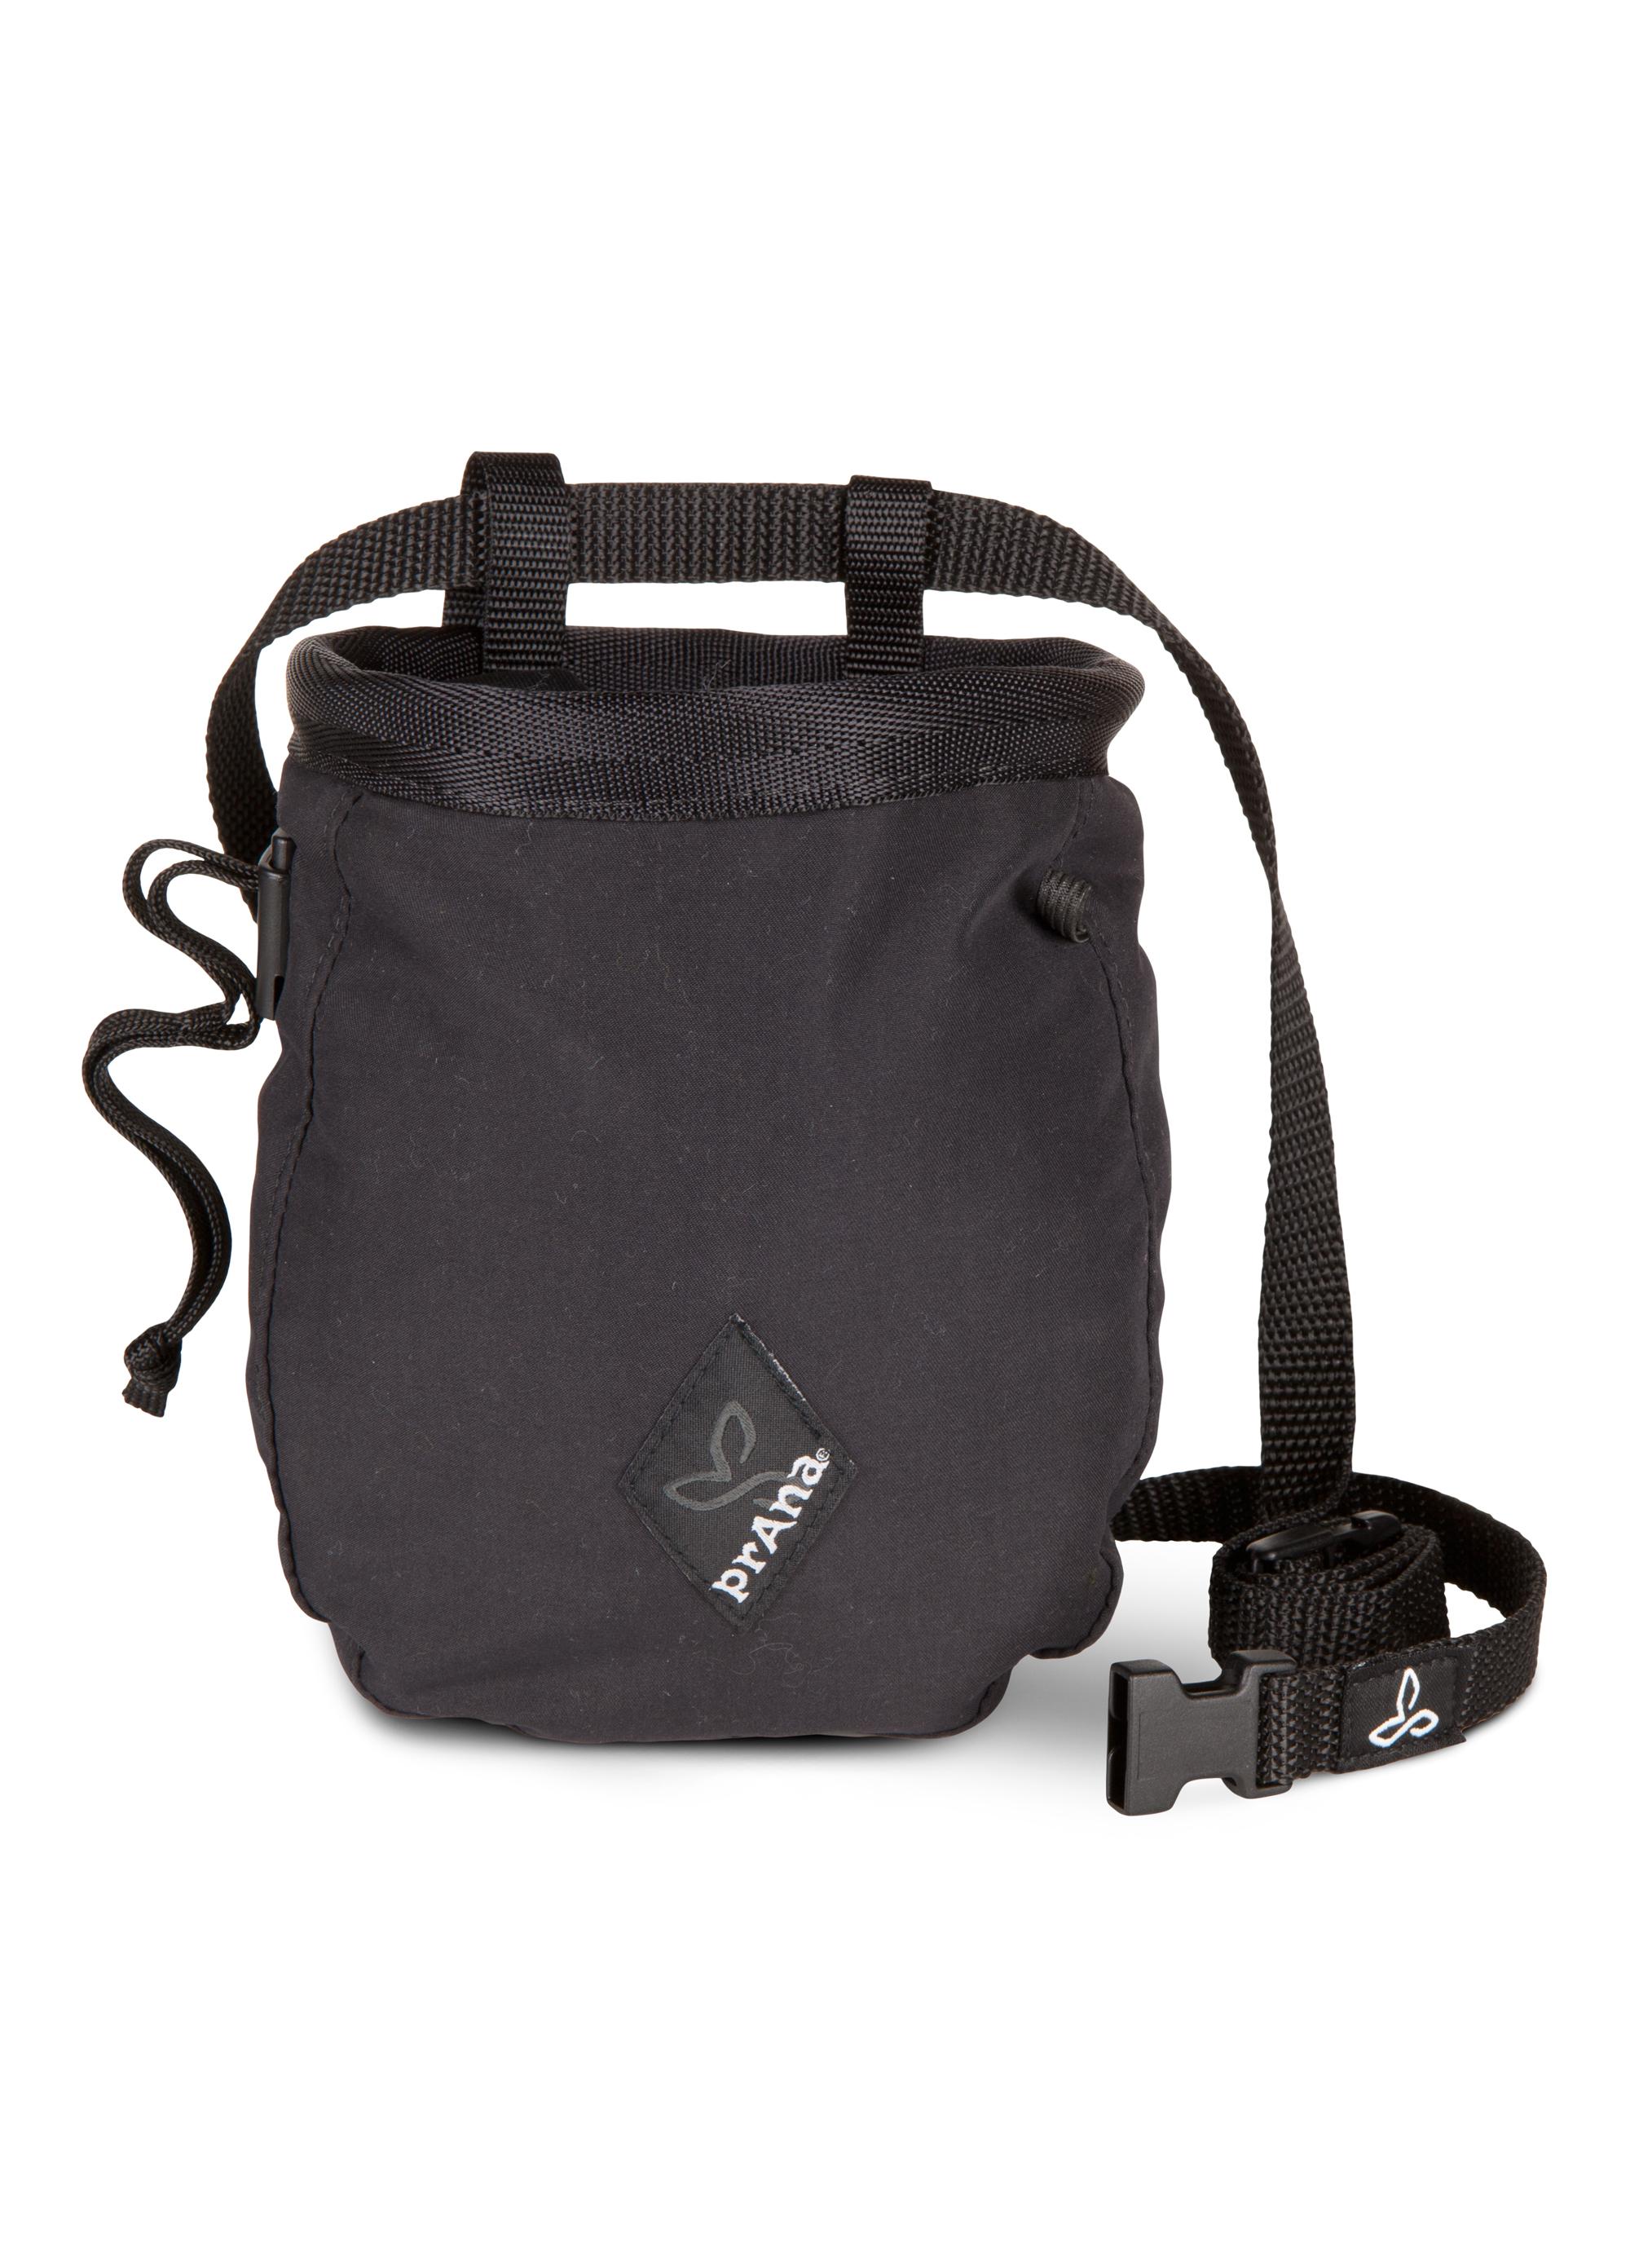 Prana Women's Chalk Bag With Belt - Sac à magnésie femme